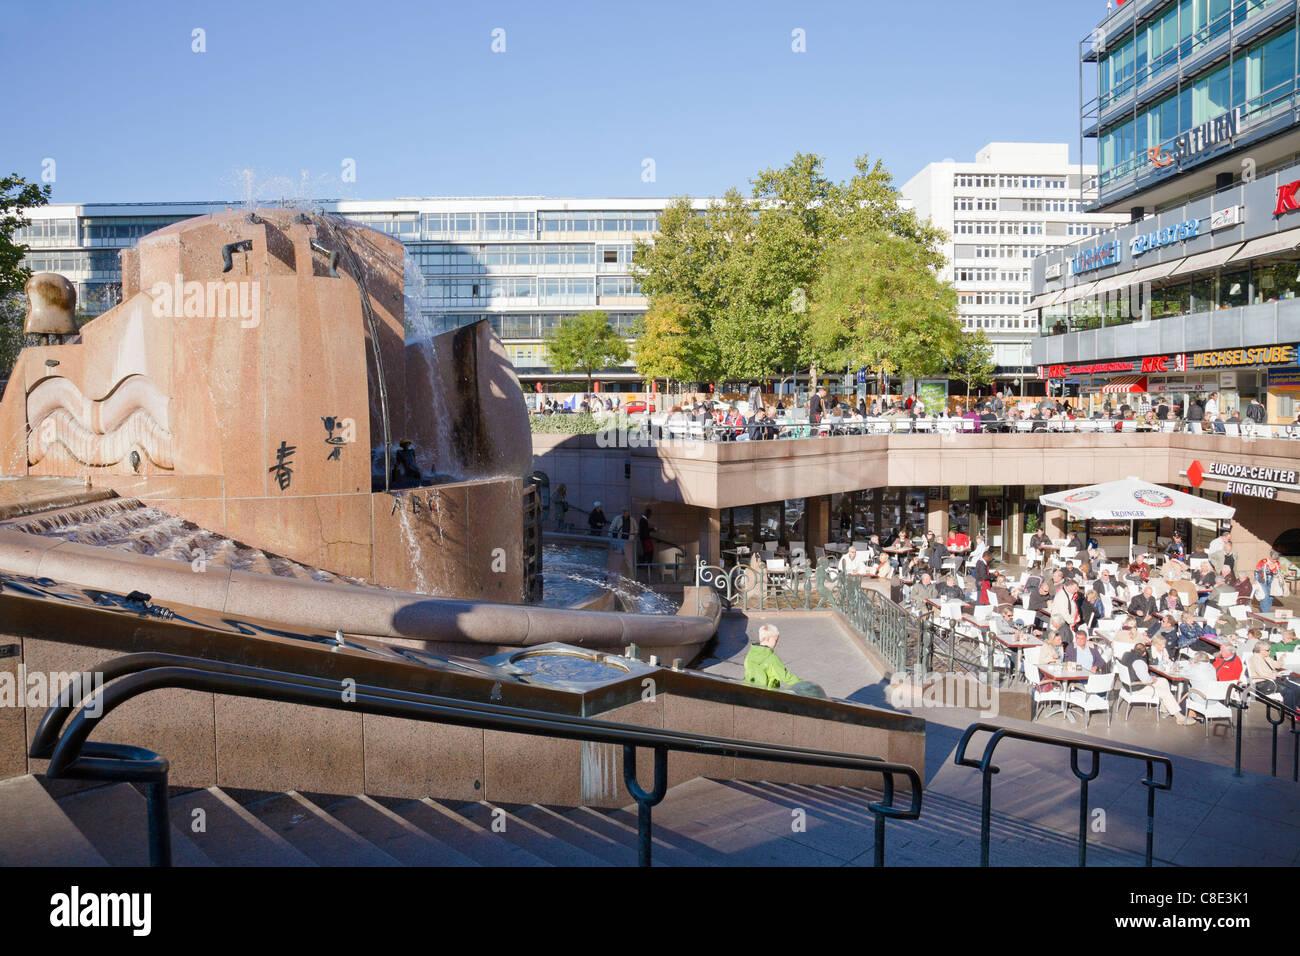 Weltkugelbrunnen (World Fountain) on Breitscheidplatz, Europa Center, Berlin, Germany - Stock Image